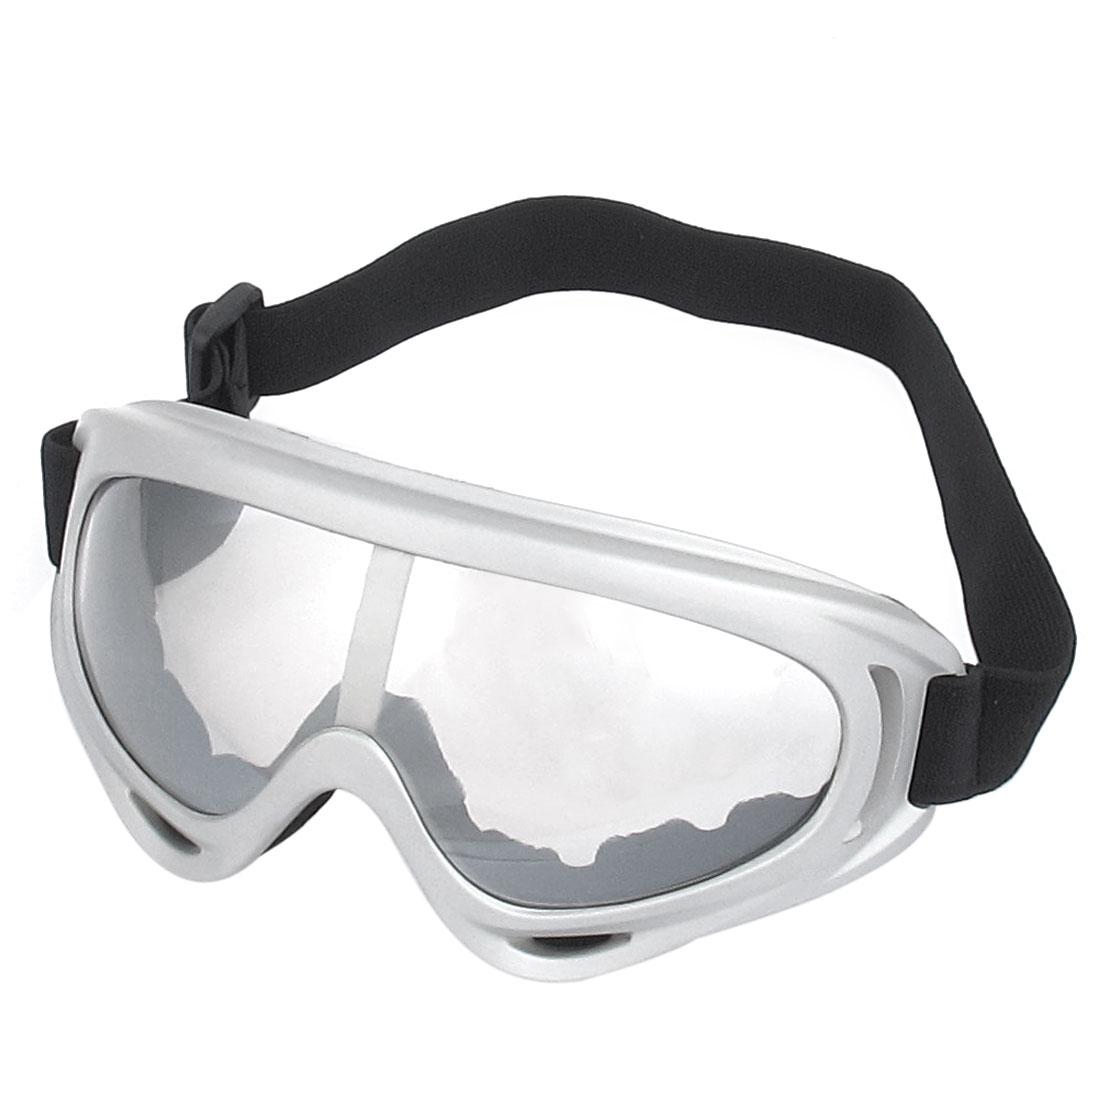 Motorcycle Biker Adjustable Elastic Strap Dustproof Windproof Goggles Sunglasses